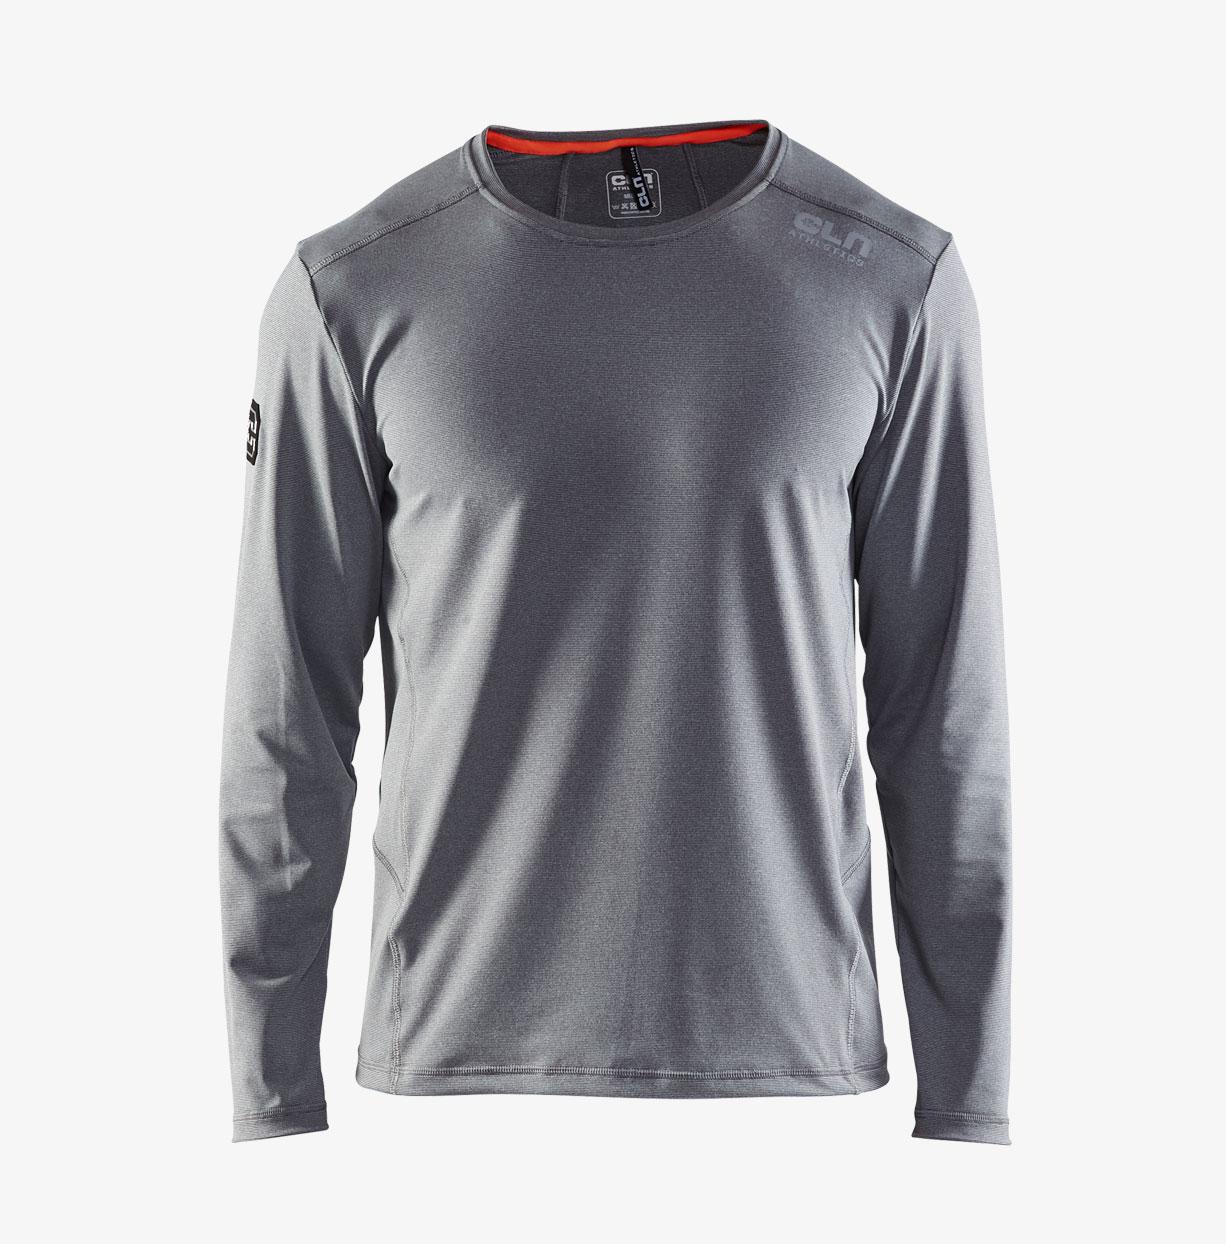 cln-ultra-longslevve-tee-grey-front